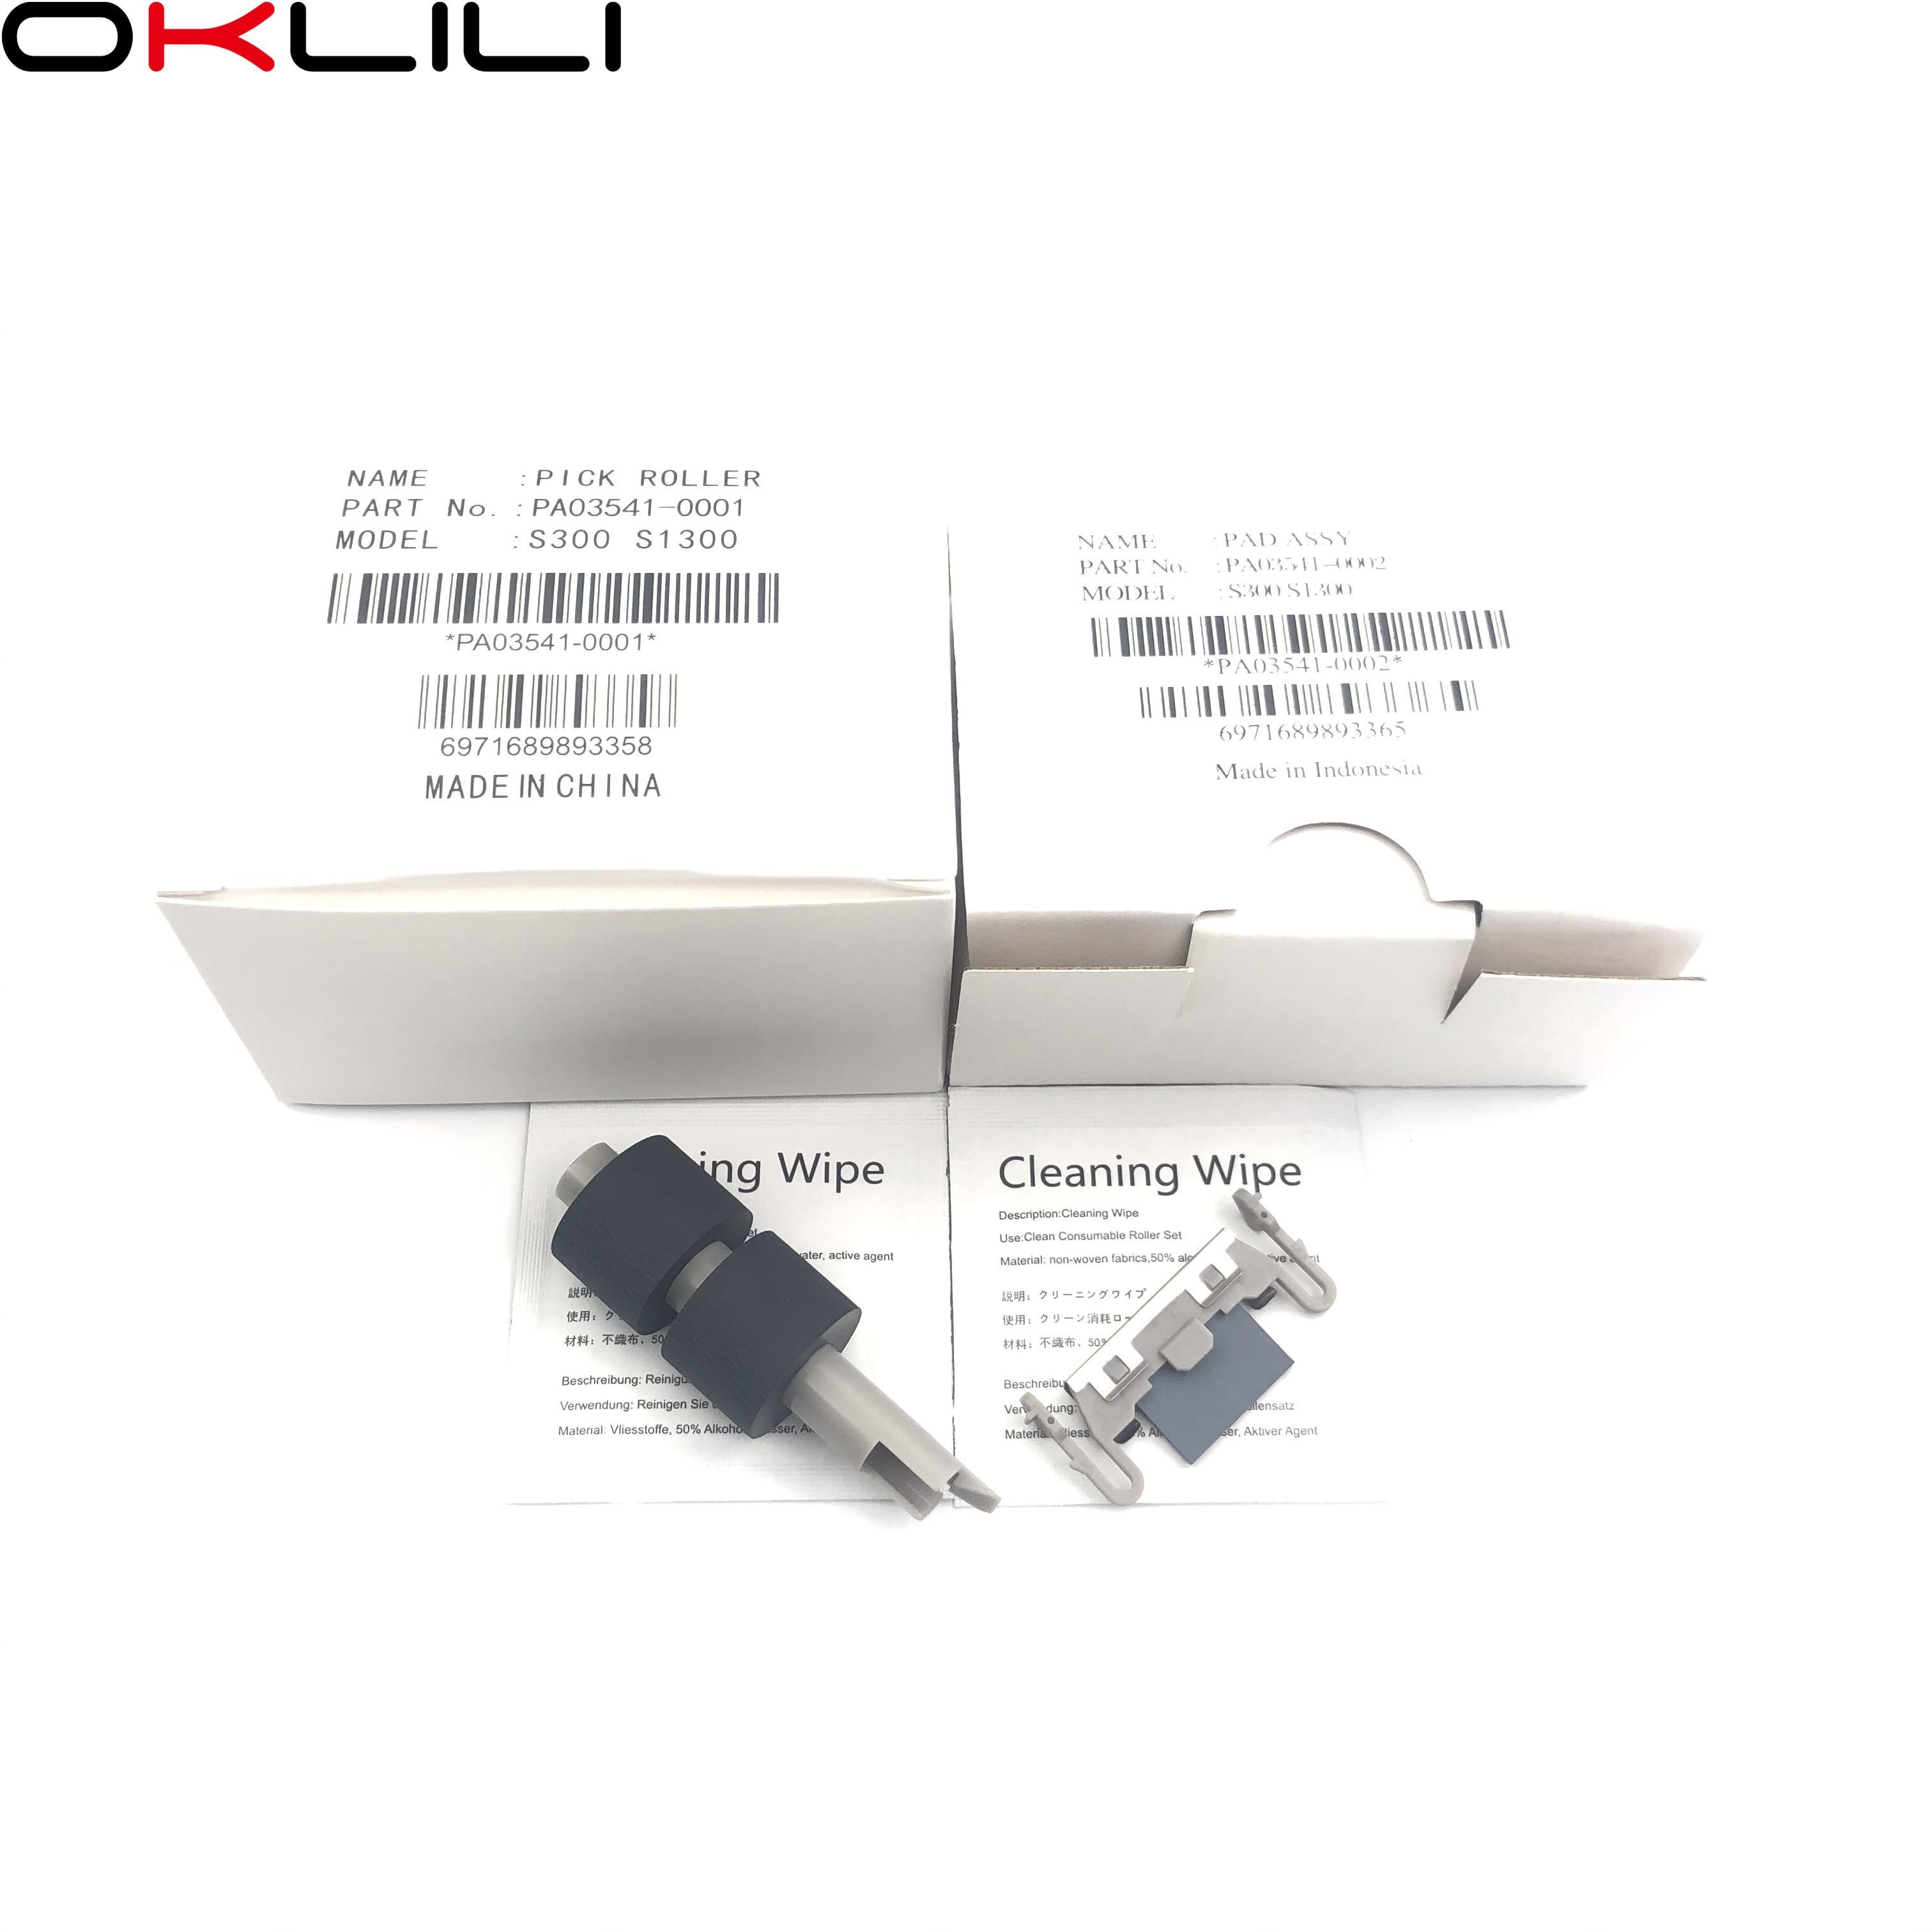 1 X PA03541-0001 PA03541-0002 consumibles a de la camioneta de separación de...